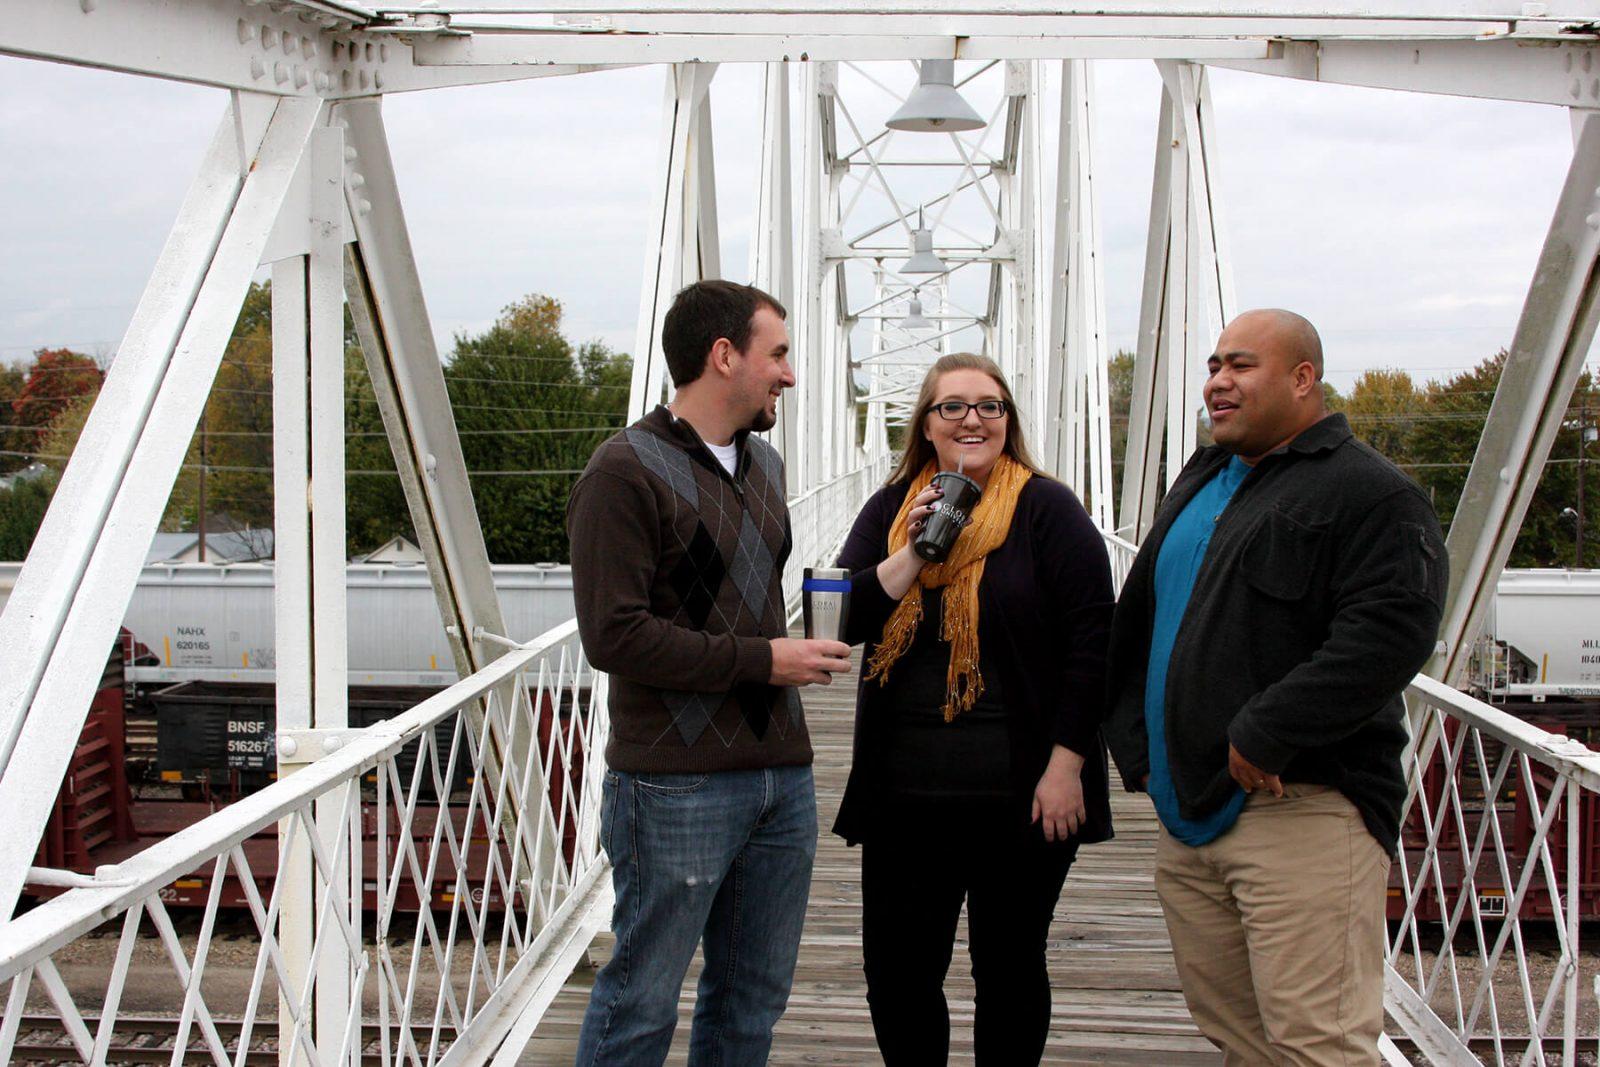 Three Global Students on walking bridge talking